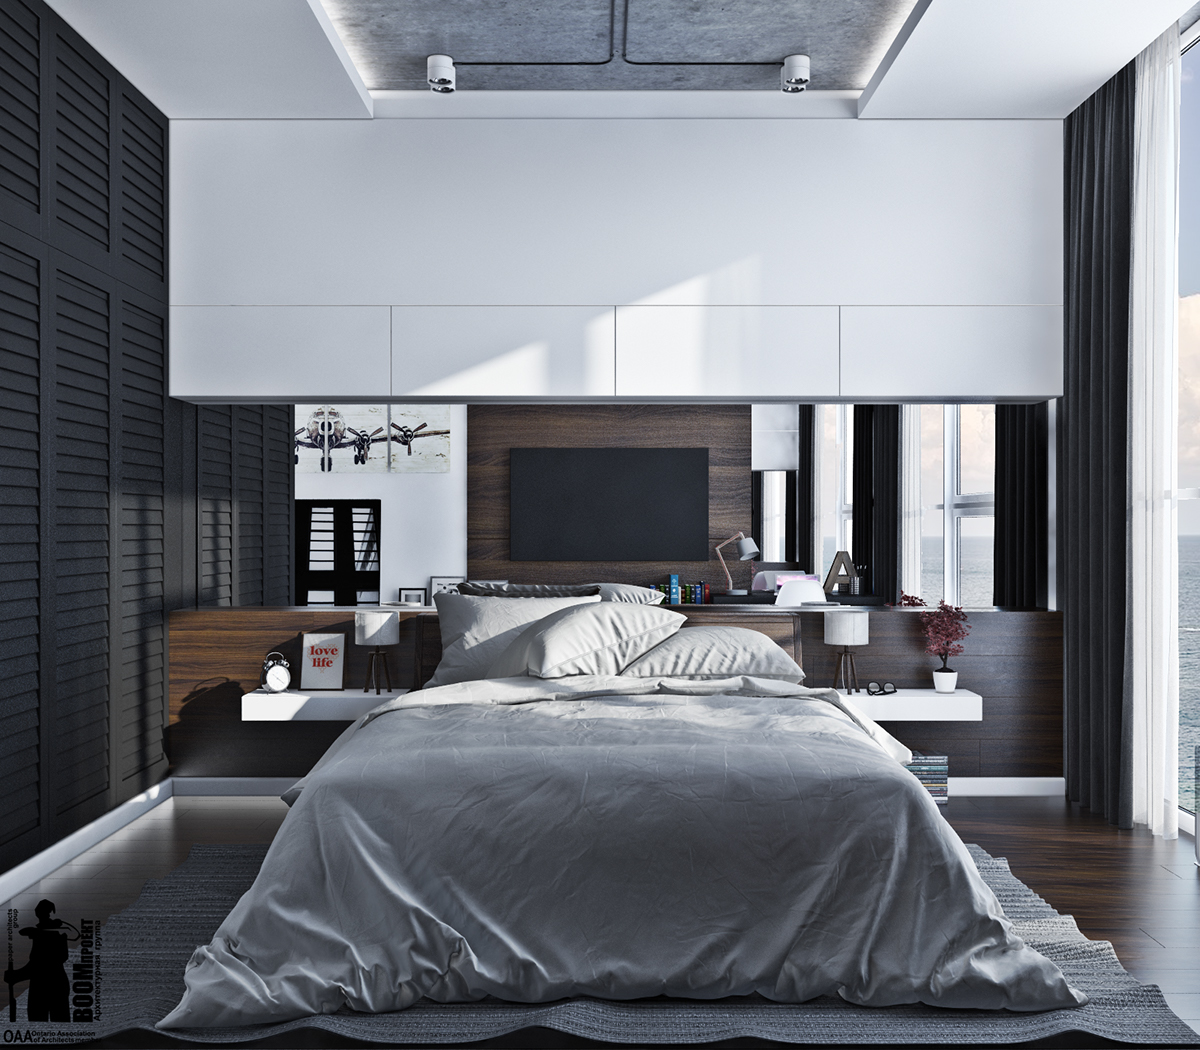 Interior design bedroom on behance for Modern men bedroom designs